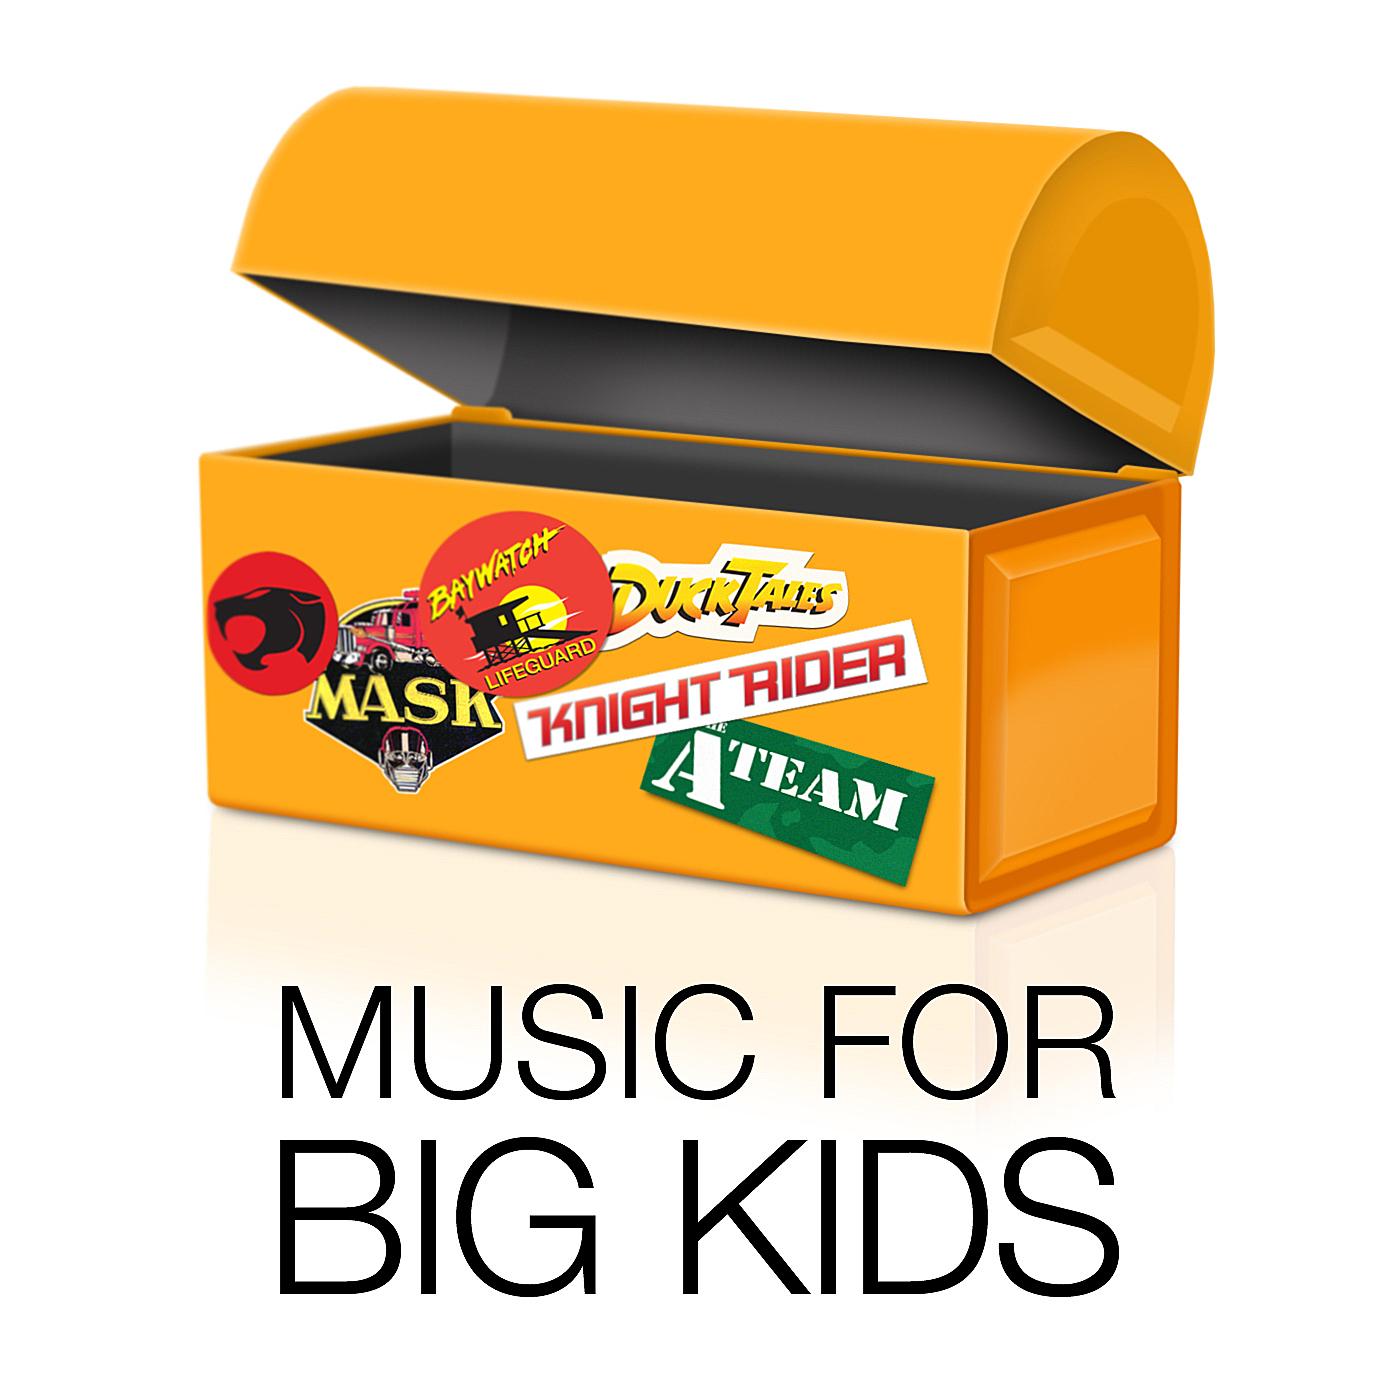 Music For Big Kids